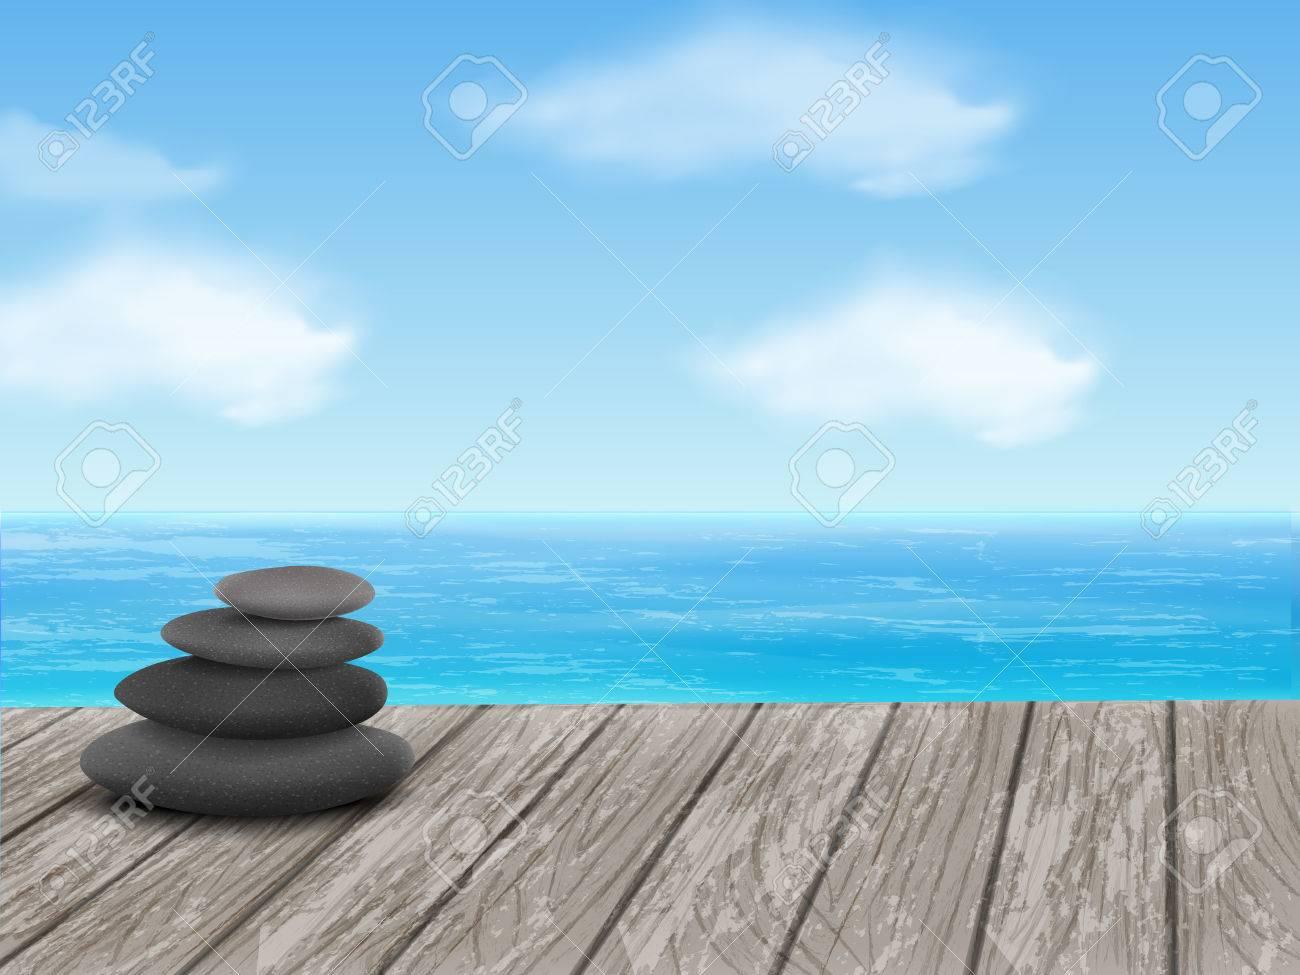 Kiezels stapel geïsoleerd op houten vloer over zee royalty vrije